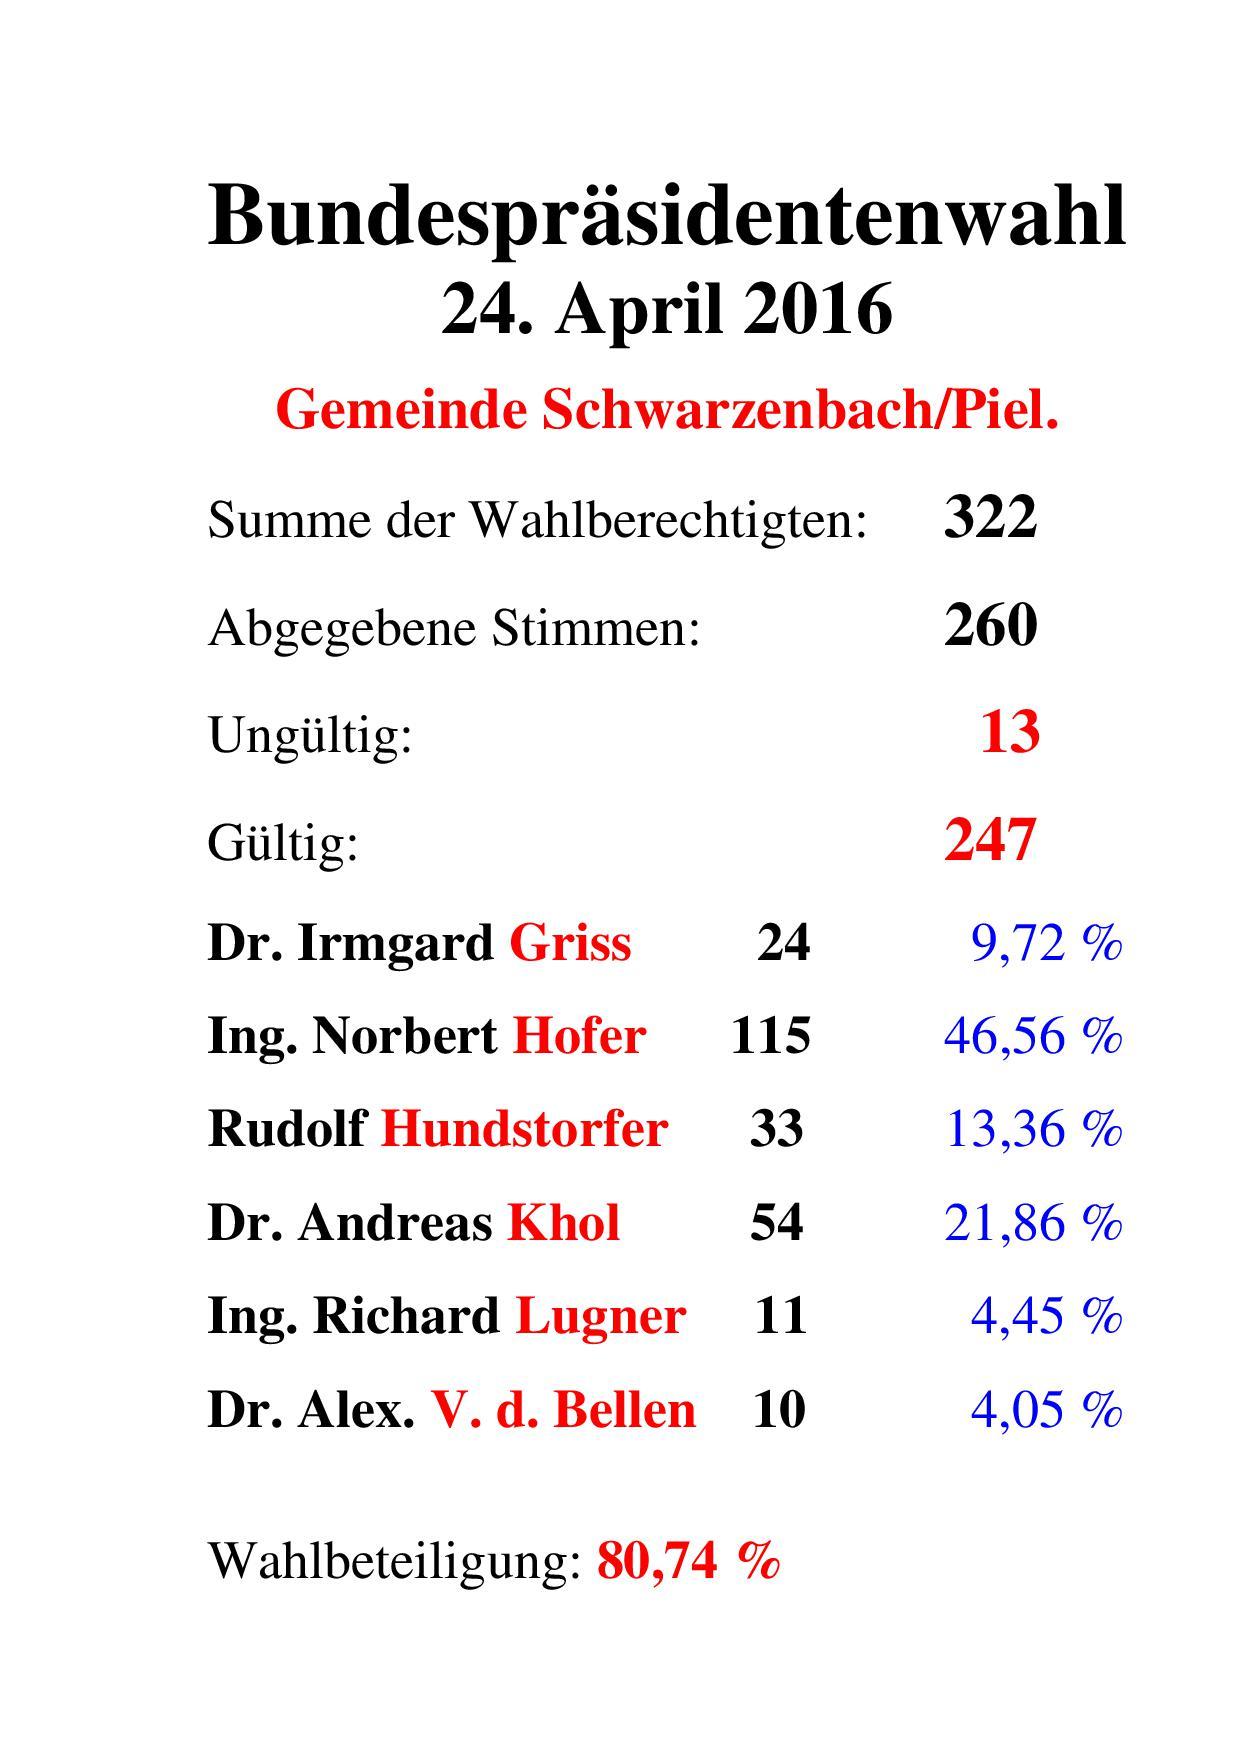 Bundespräsidentenwahl Schwarzenbach